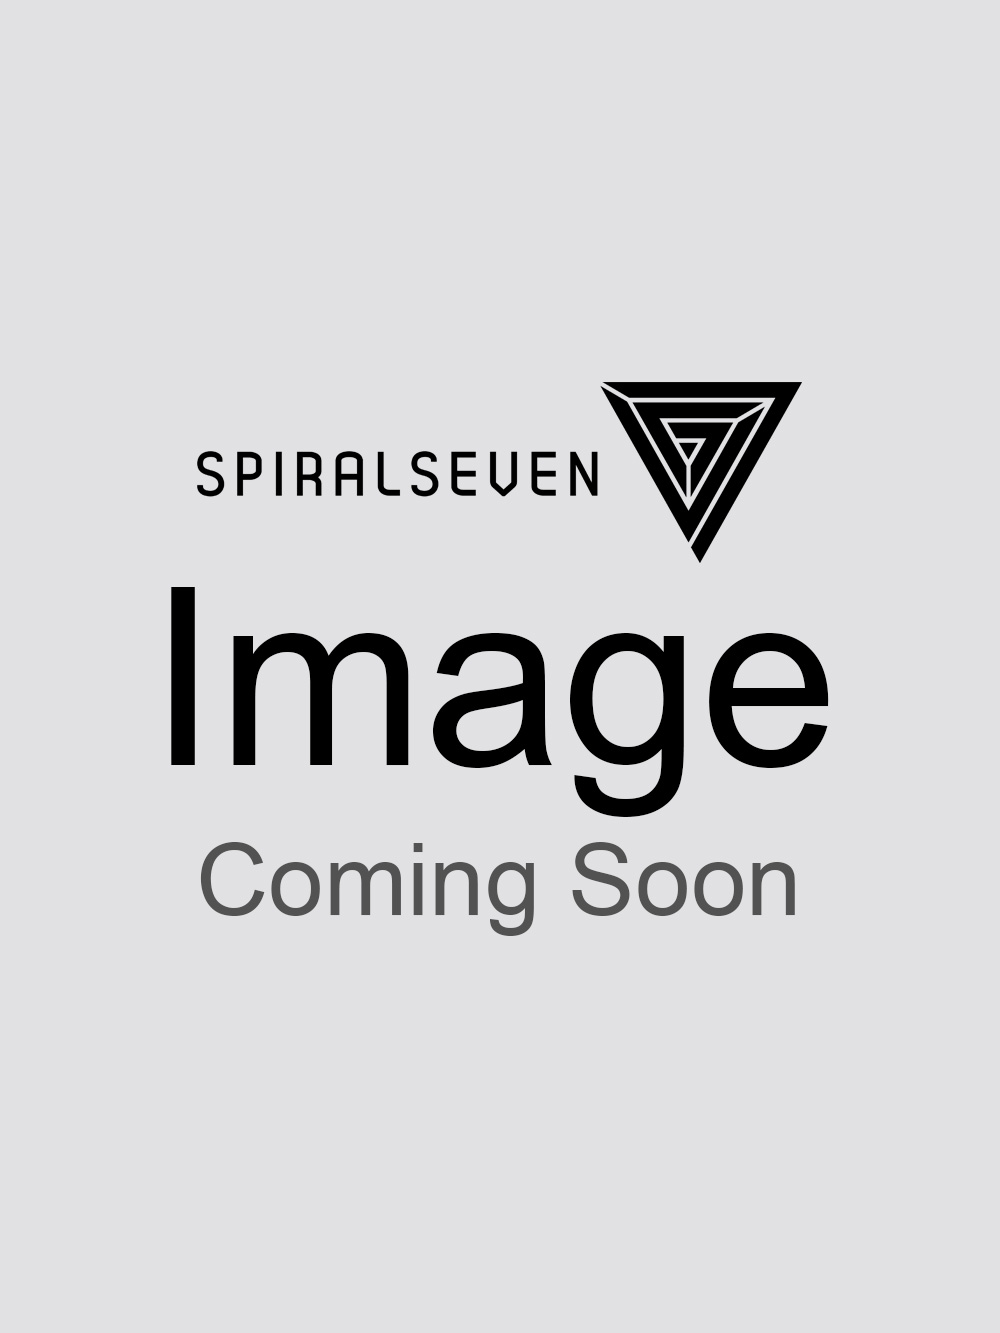 c27dcd13a60 Carhartt WIP L/S Confidential T-Shirt White / Black | Spiral Seven -  Designer Clothing